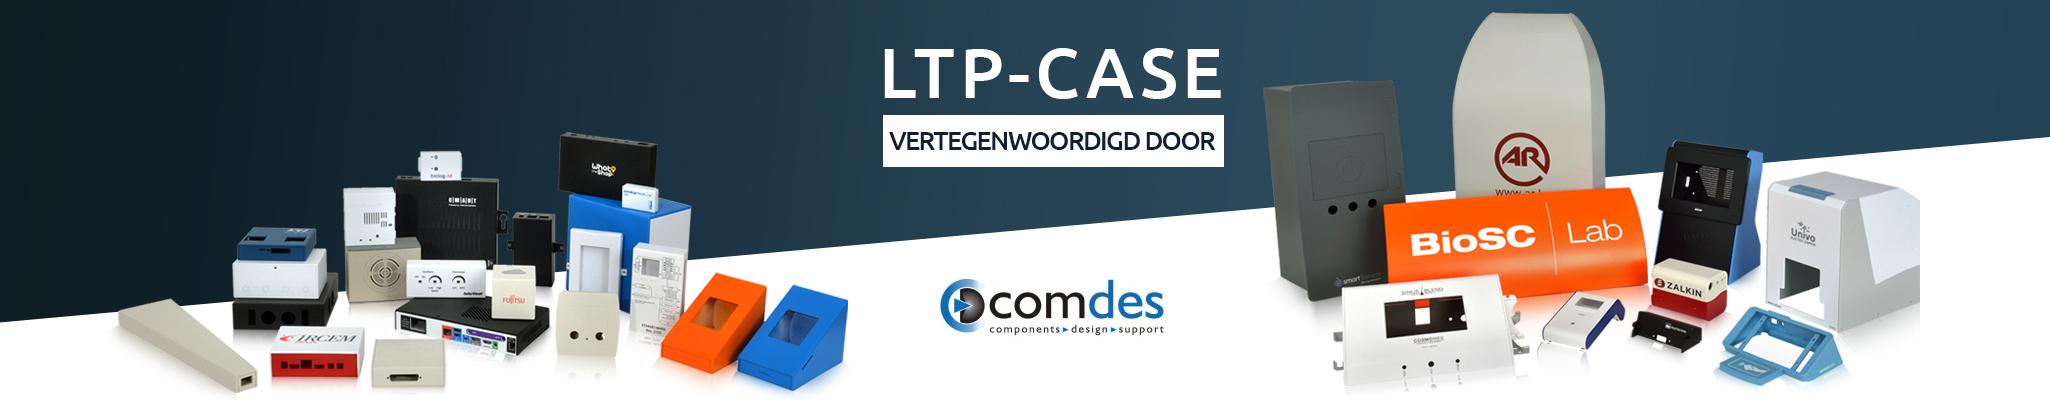 LTP Case plastic plaat met boorgroef